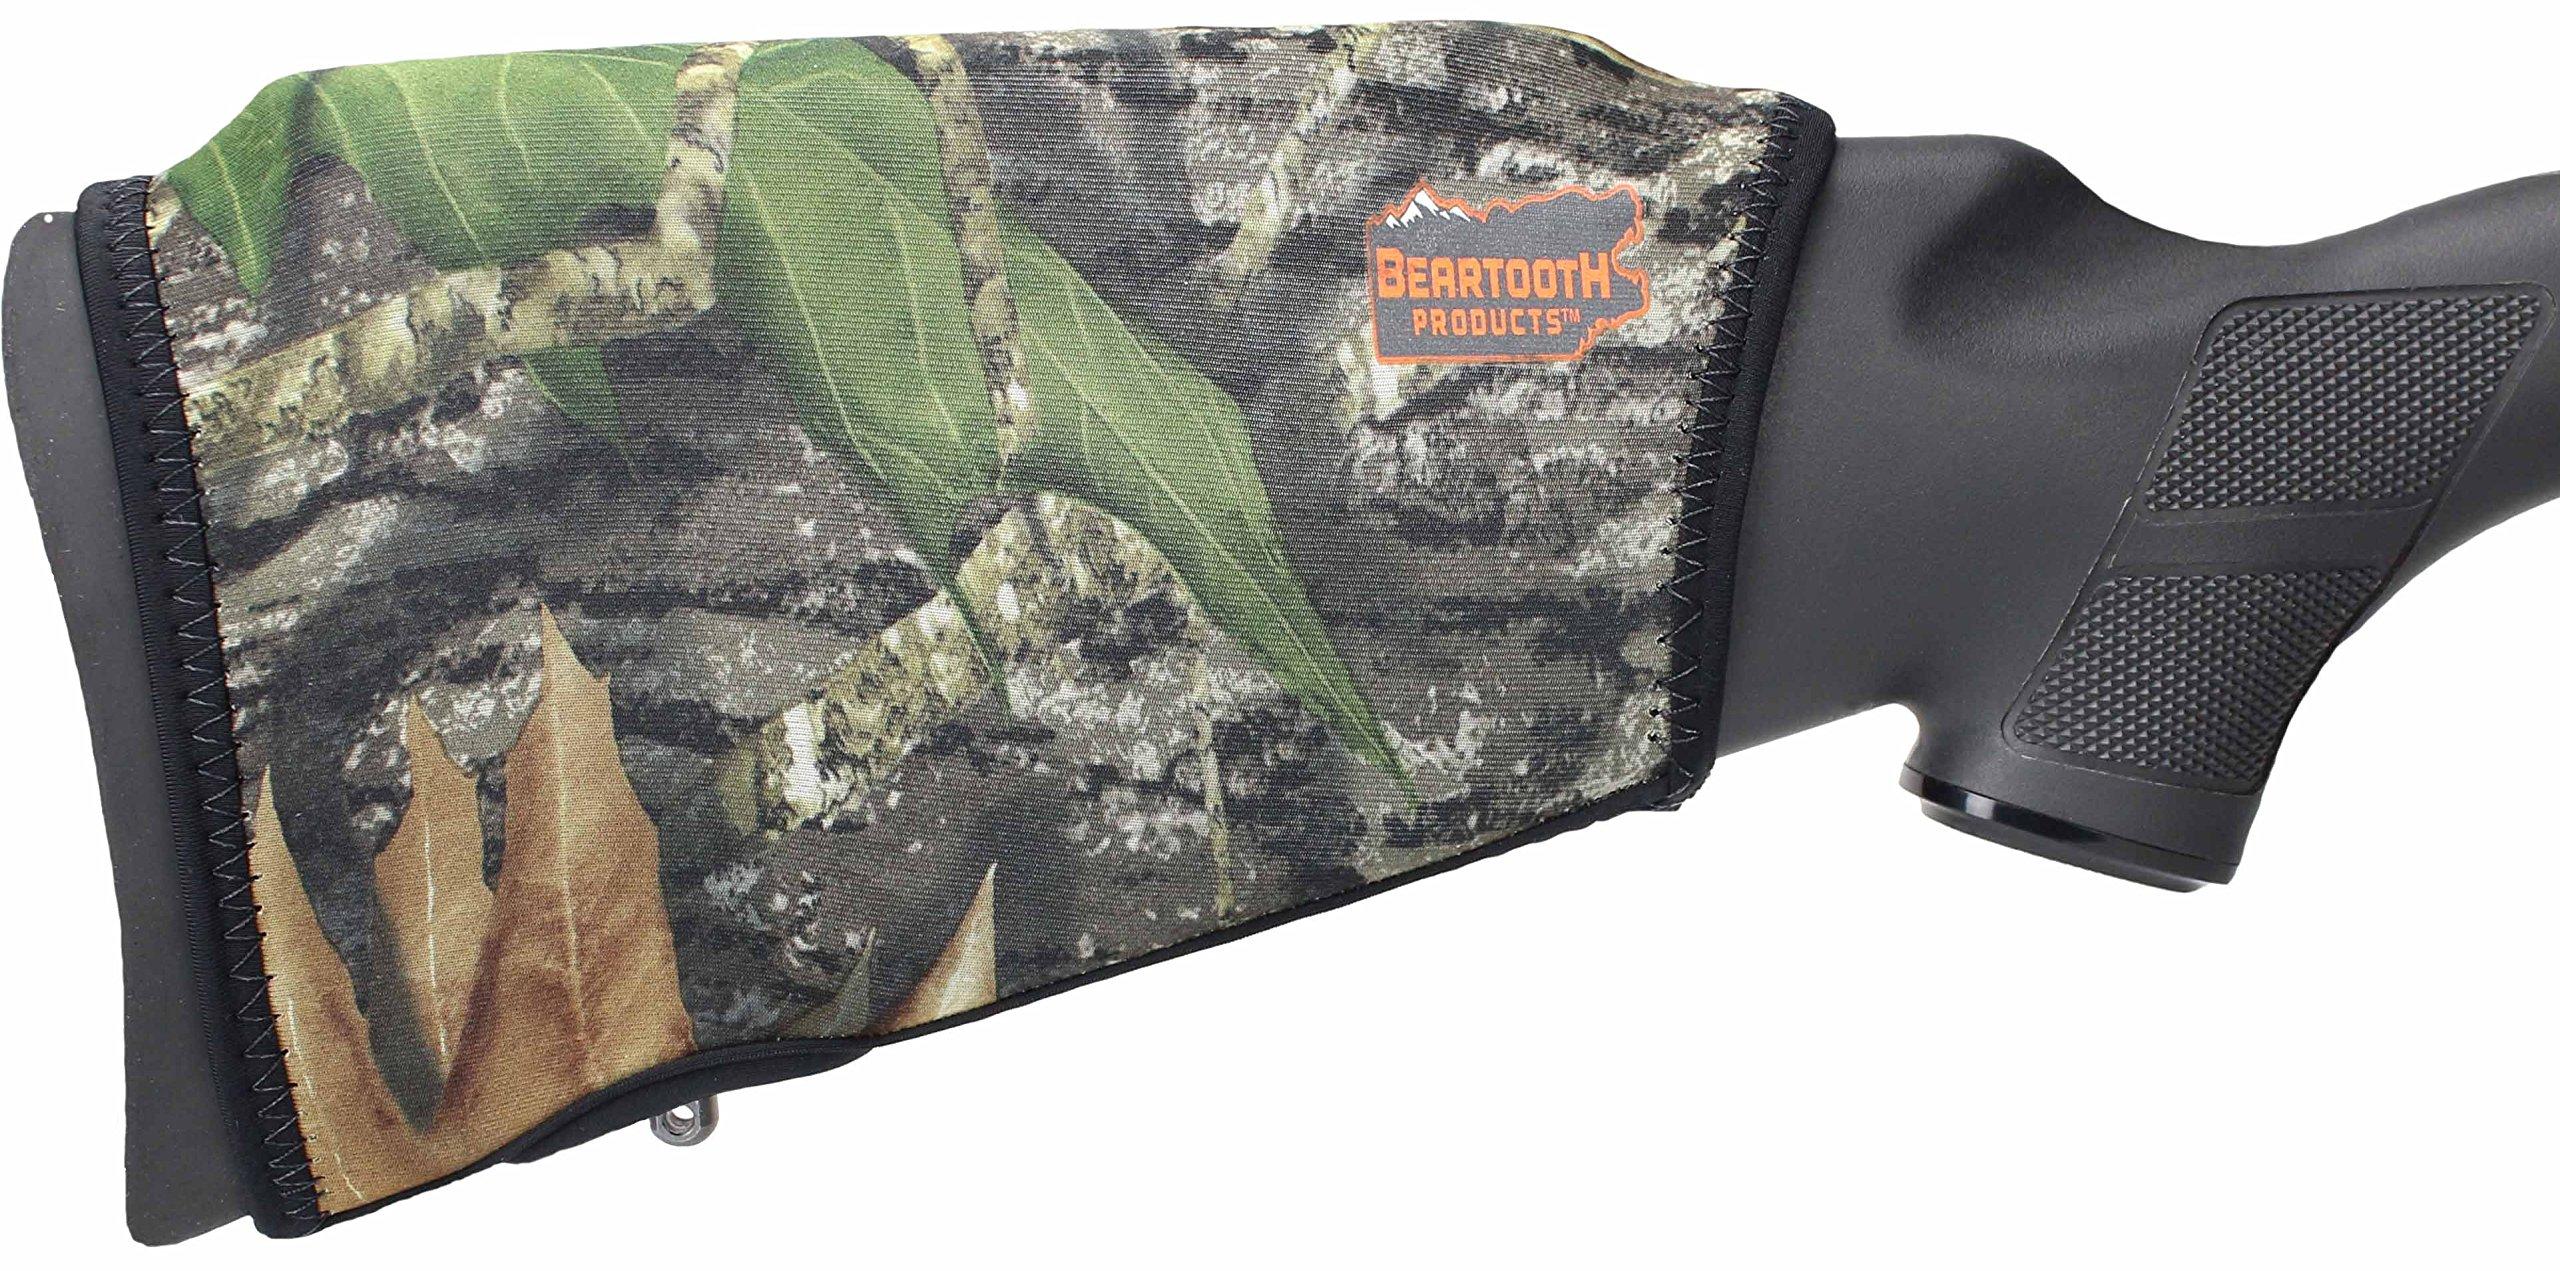 Beartooth Comb Raising Kit 2.0 - Premium Neoprene Gun Stock Cover + (5) Hi-density Foam Inserts - NO LOOPS MODEL (Mossy Oak Break-up)